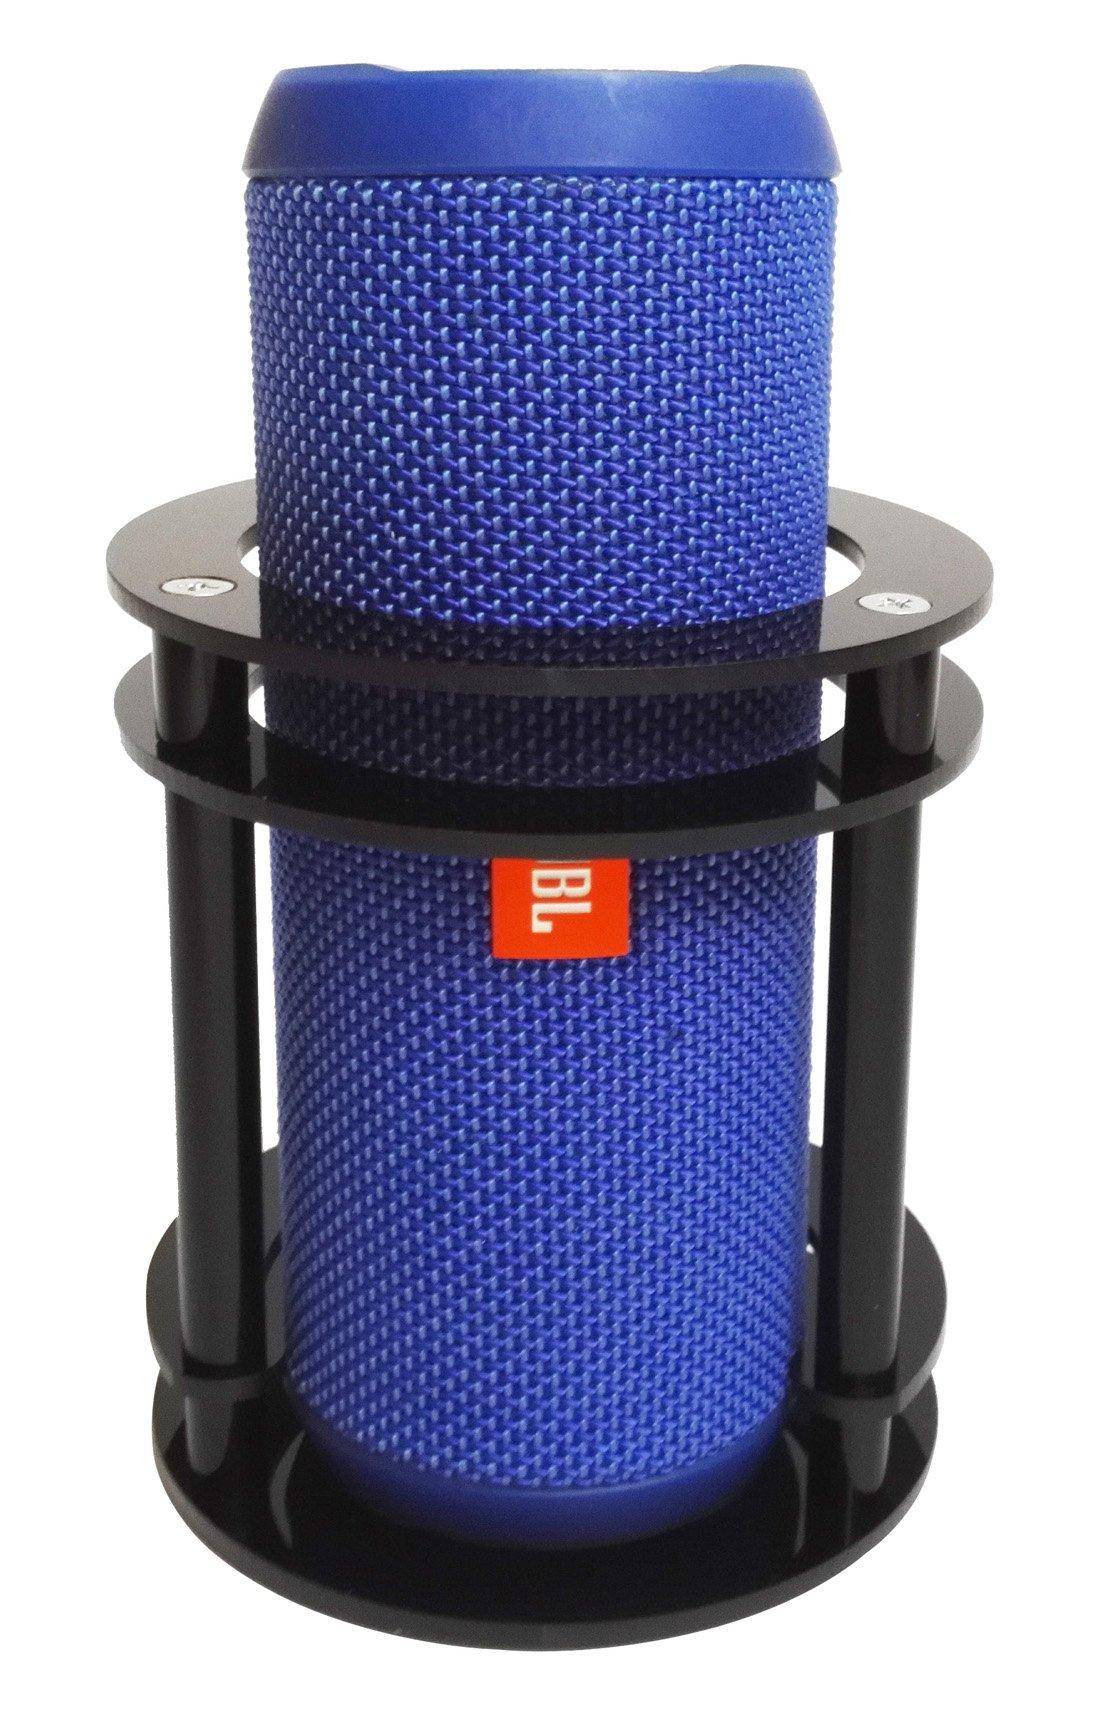 FitSand(TM Speaker Stand Holder Guard Station for JBL Flip 4/3 / 2/1 Splashproof Portable Bluetooth Speaker - Black